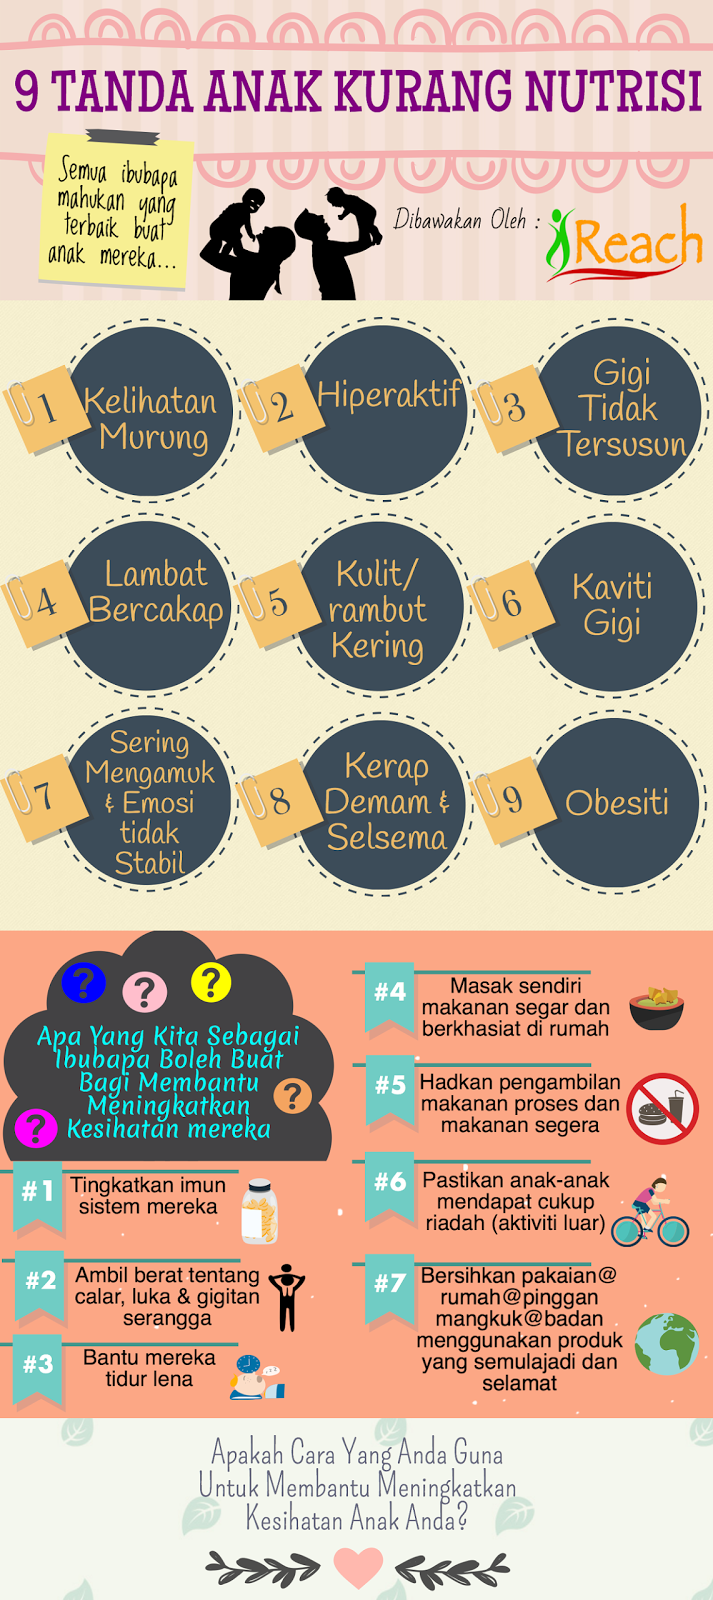 Anak Enggan Makan: Tips Makanan Untuk Anak Kurang Berat Badan